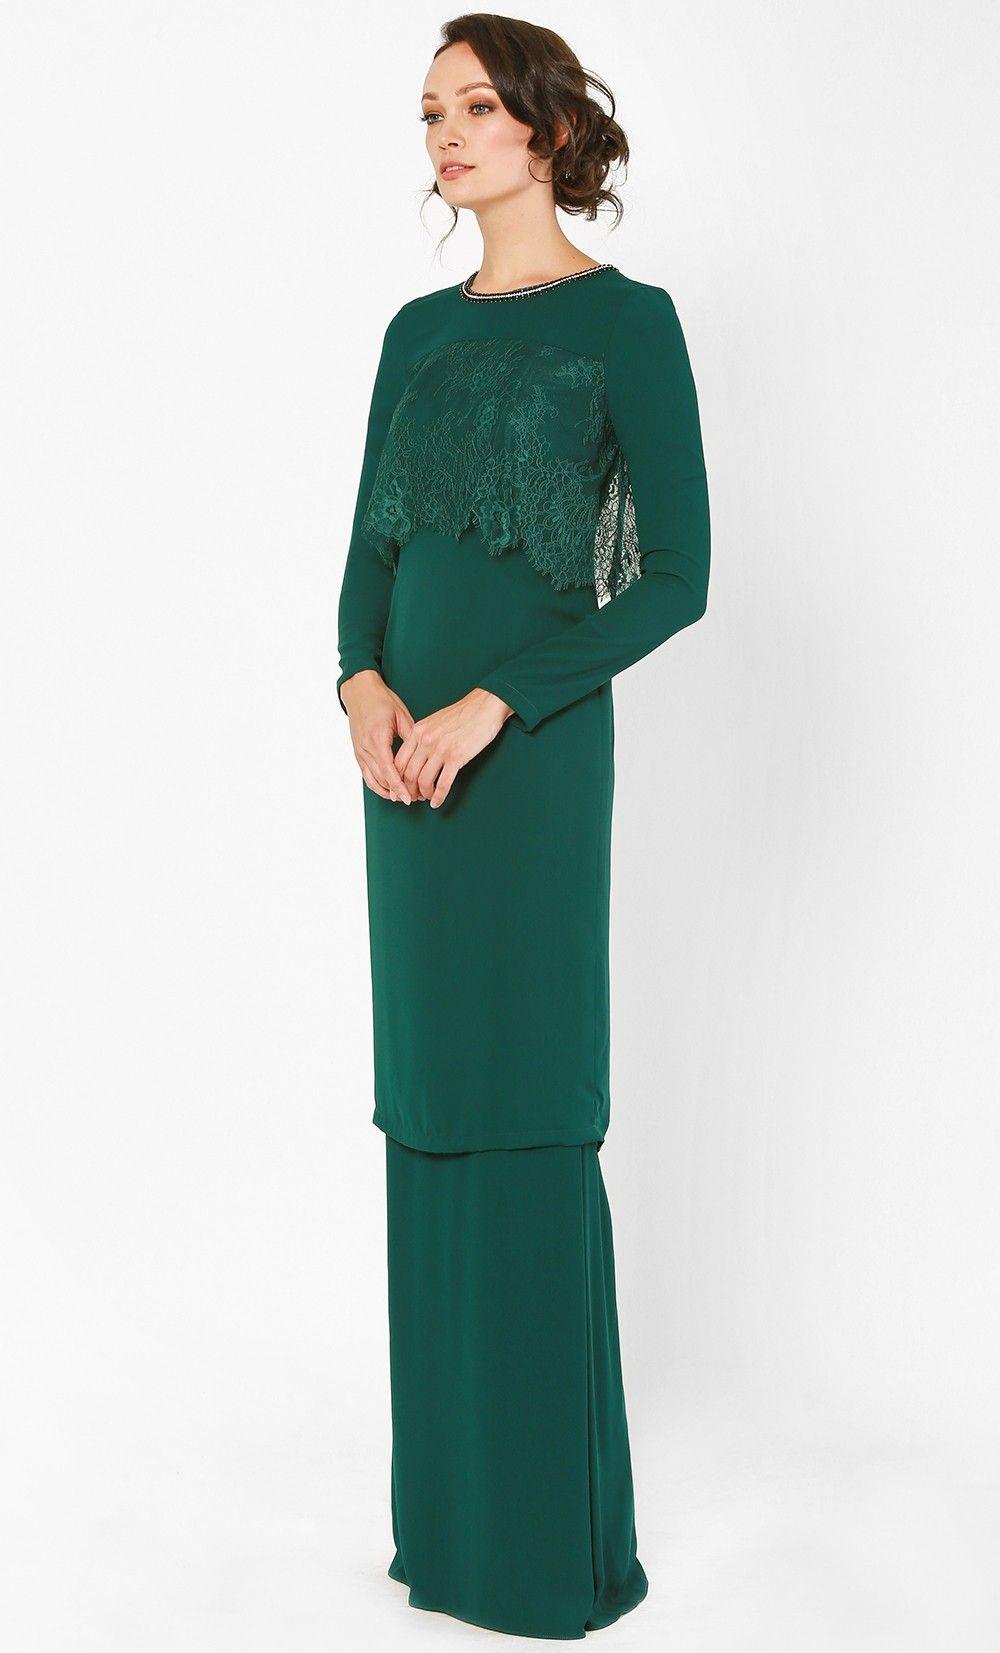 Baju-Kurung-Terkini-Lace.jpg (12×12)  Model baju wanita